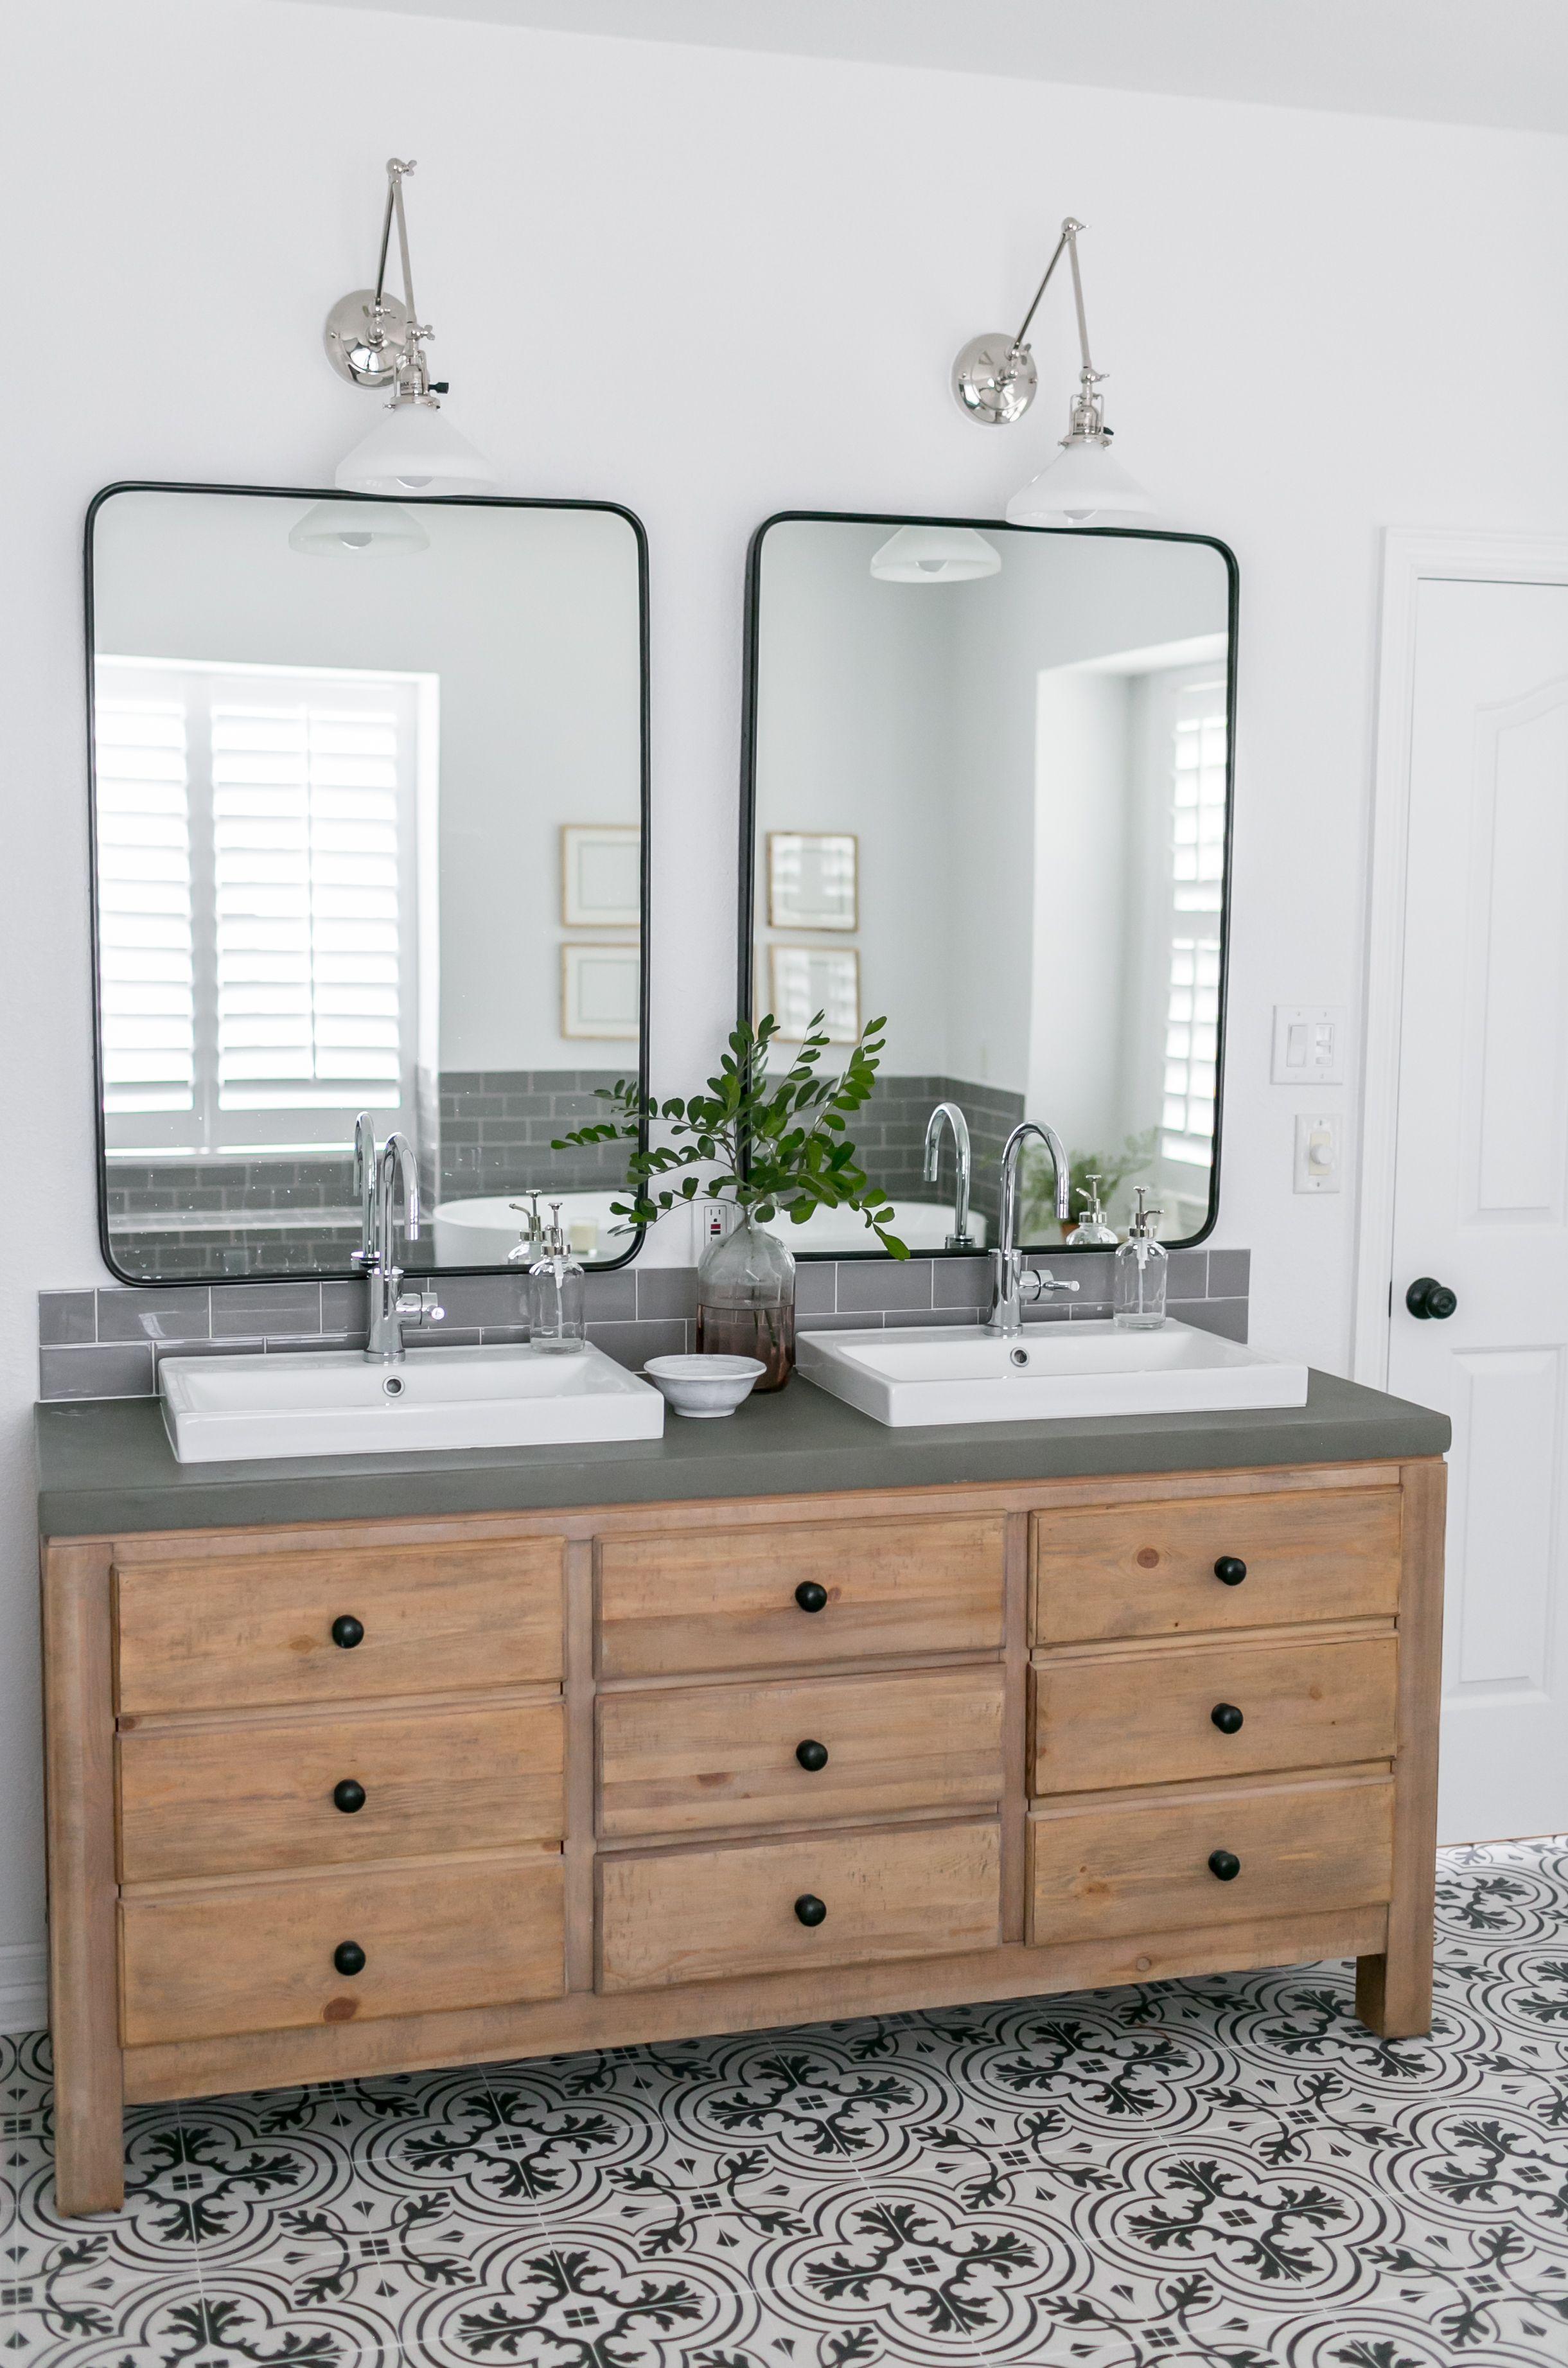 Before After Hurricane Harvey Project Living Room And Master Bathroom Badezimmer Renovieren Badezimmer Renovierungen Und Badezimmer